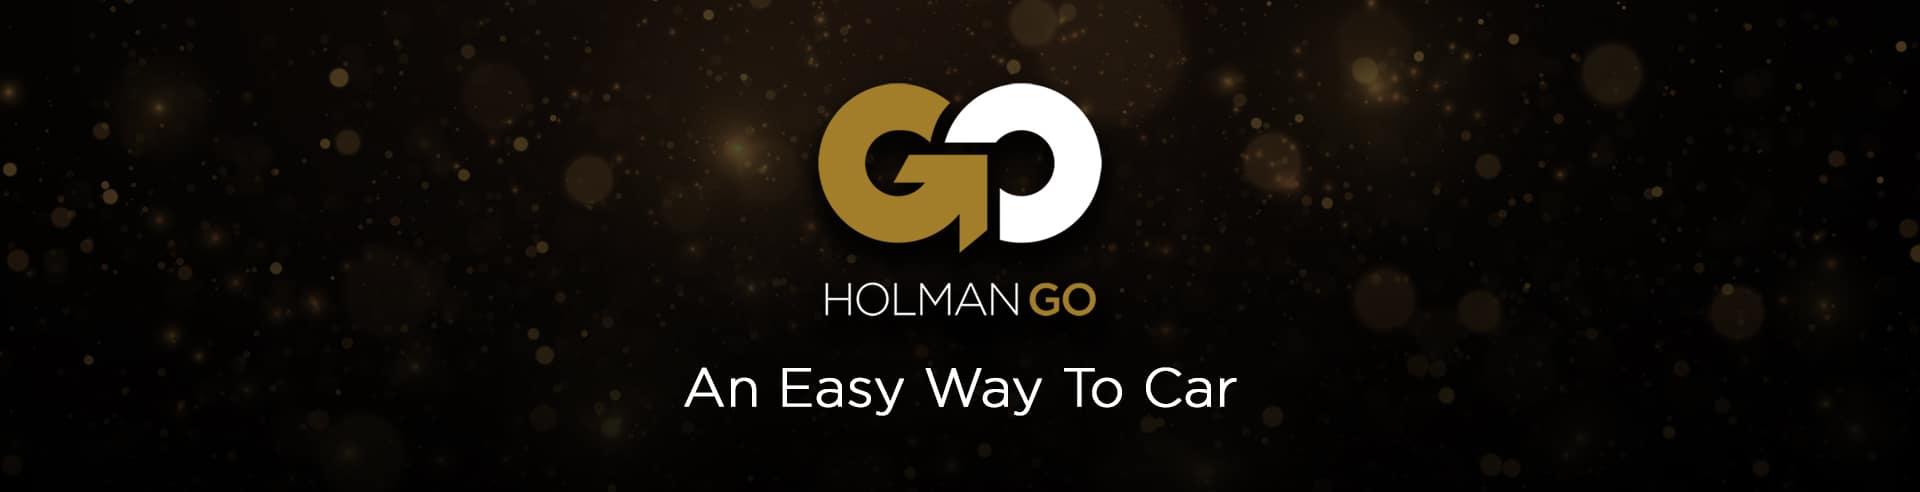 Holman Go - An Easy Way to Car banner